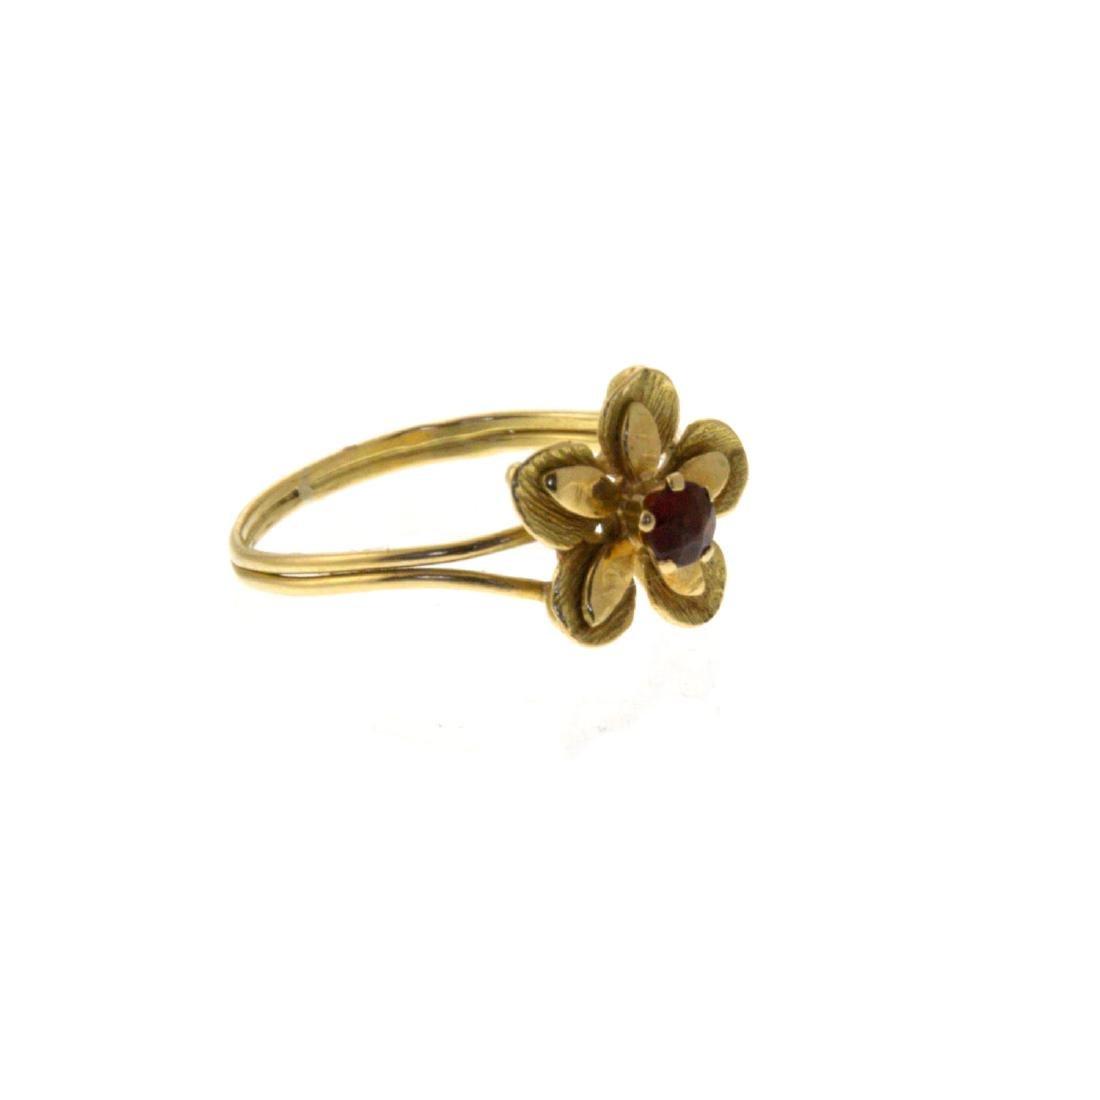 18k Yellow Gold Flower Ring. - 5